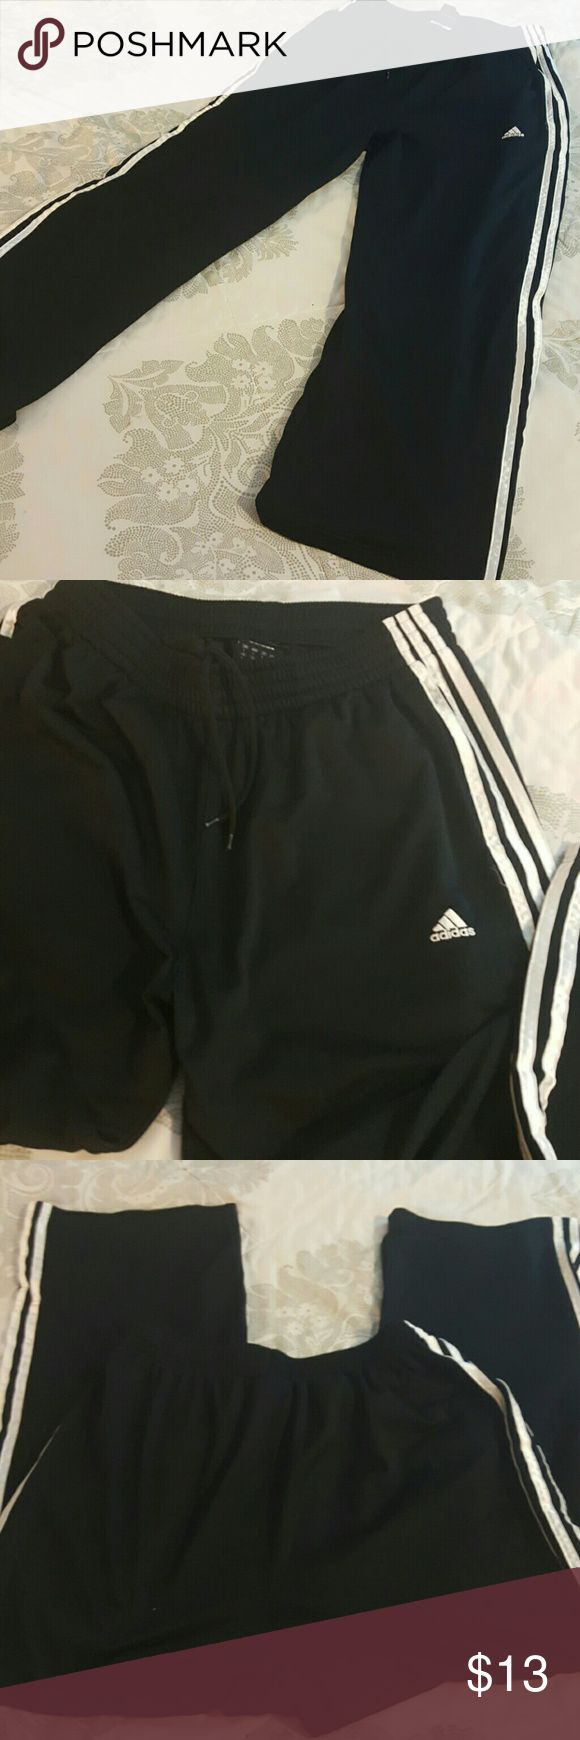 Classic Men's Adidas Black Warm-up Athletic Pants Adidas Athletic Pants with drawstring waist. Polyester material. adidas Pants Sweatpants & Joggers